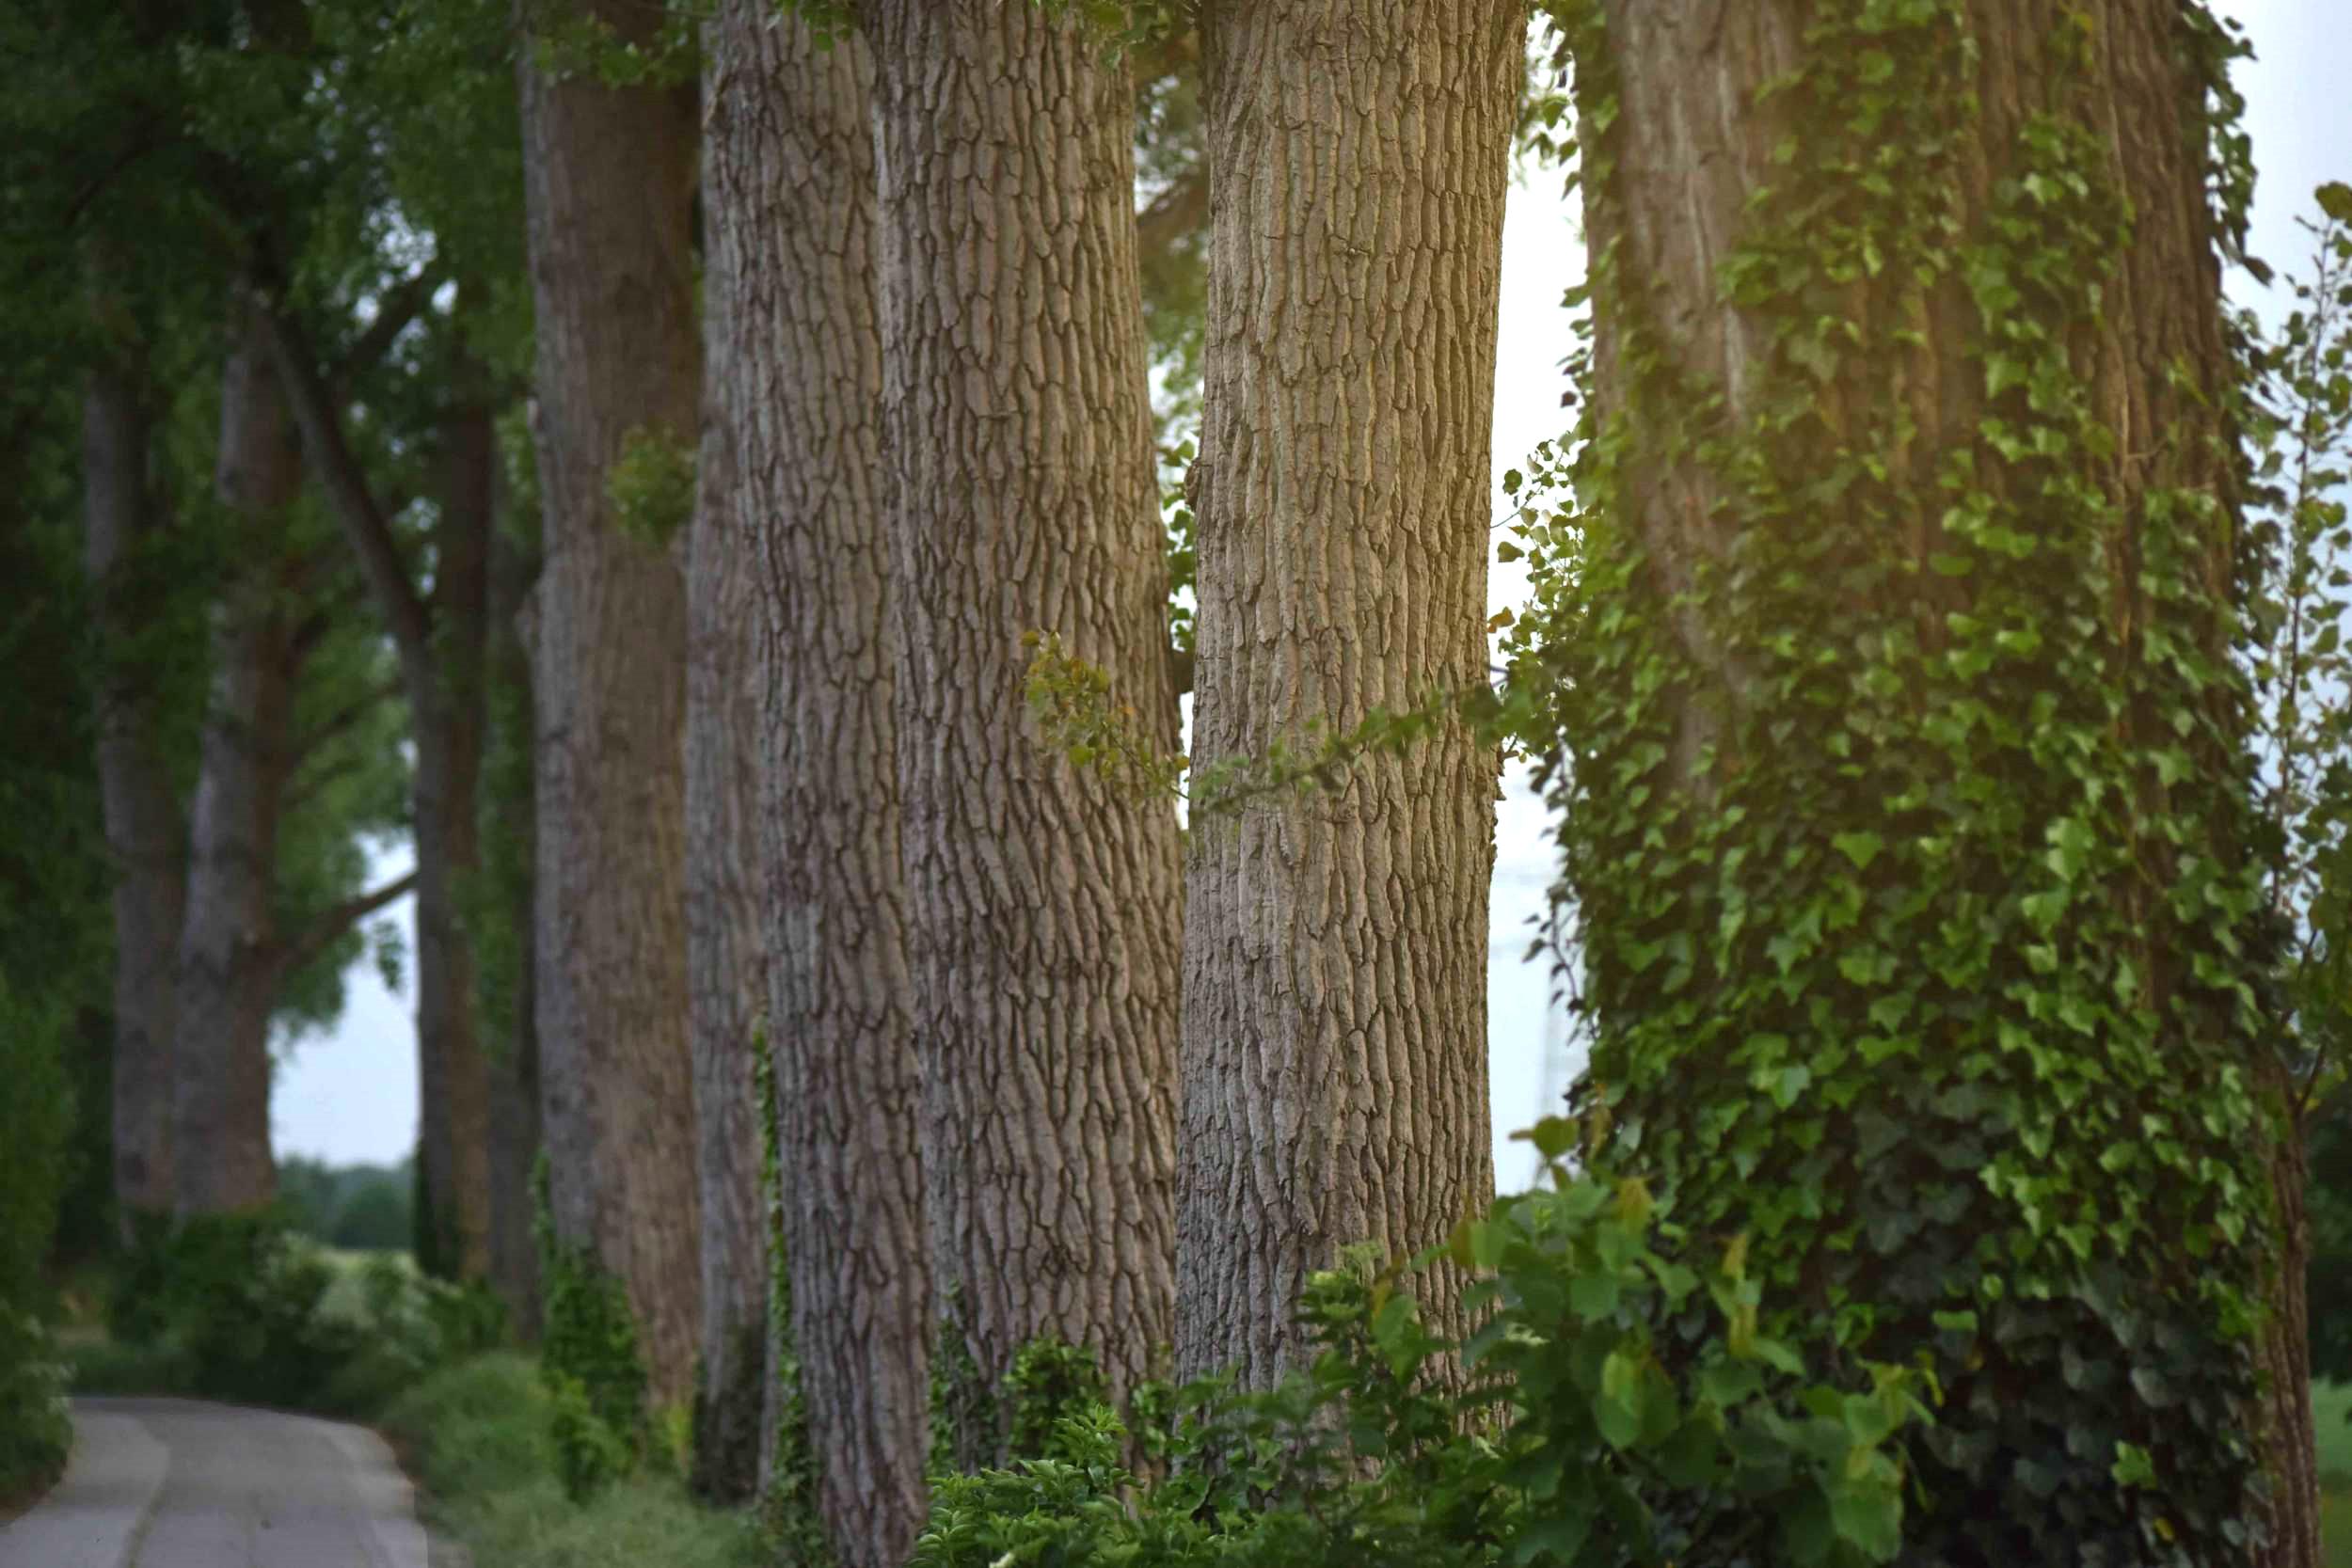 Larger than life trees, village near Düsseldorf, Germany. Photo: Nicola Nolting, Image©sourcingstyle.com